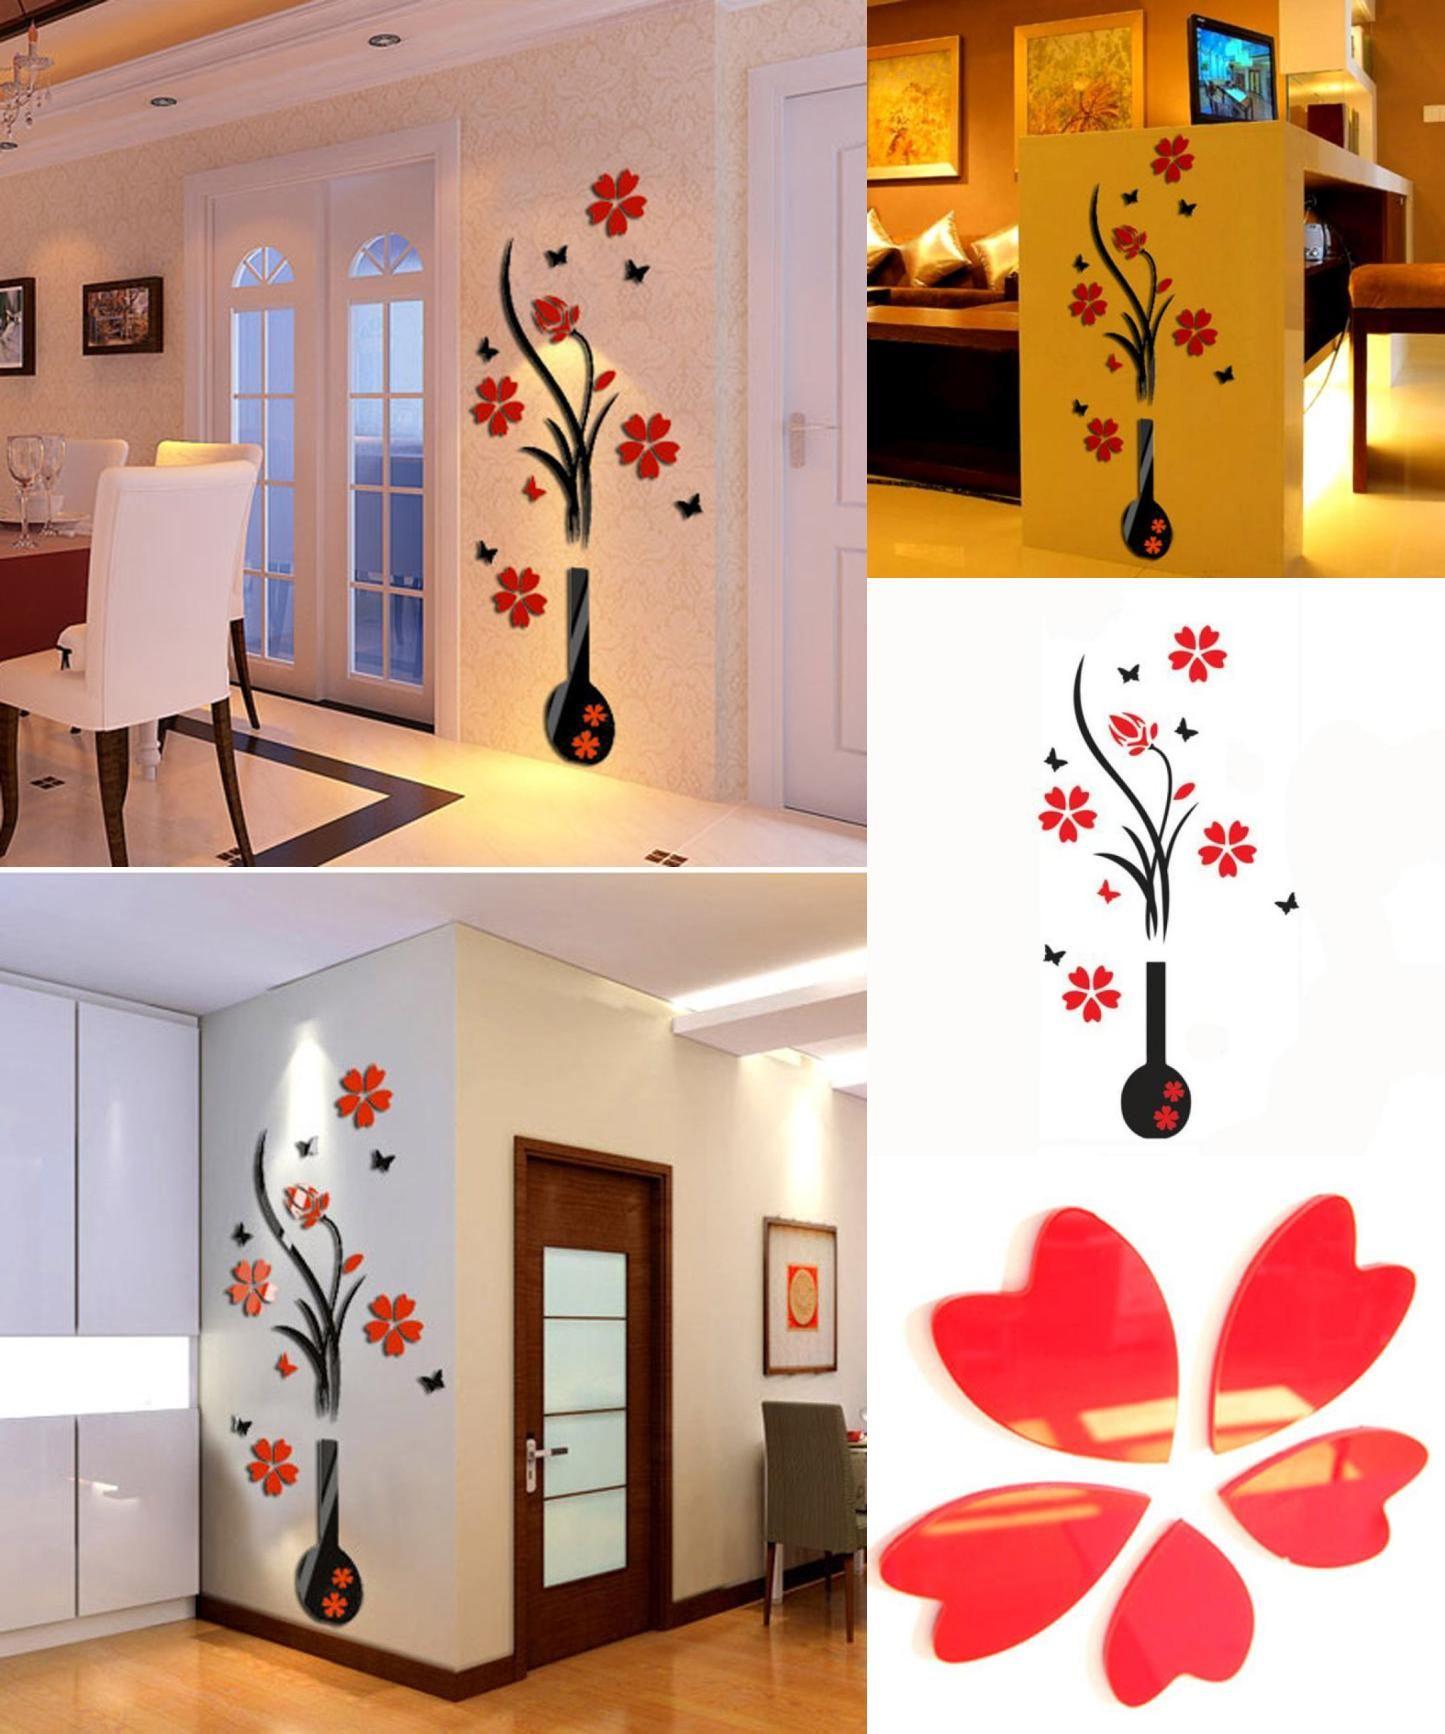 3D Wall Stickers DIY Vase Flower Tree Crystal Acrylic Decal Vase Acrylic Sticker